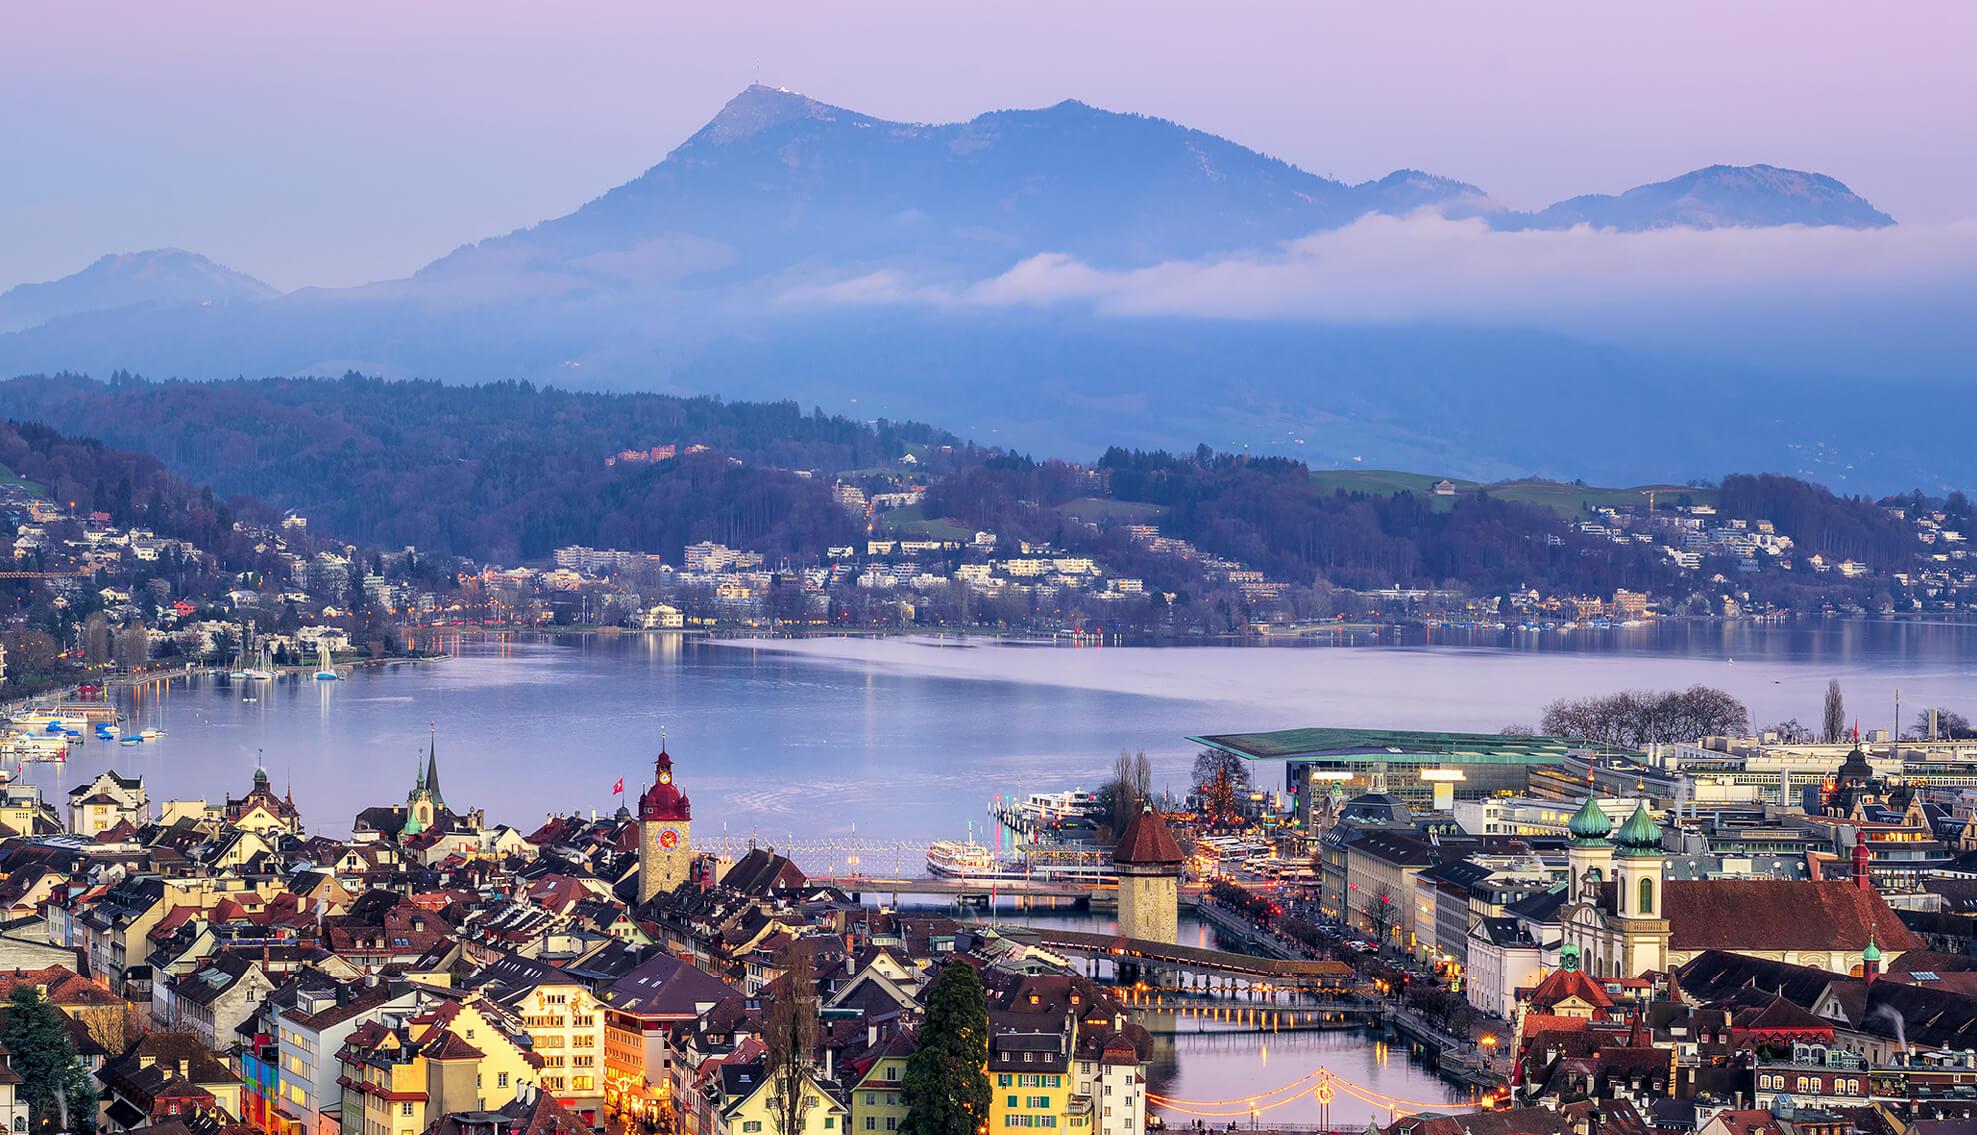 Luzern landscape